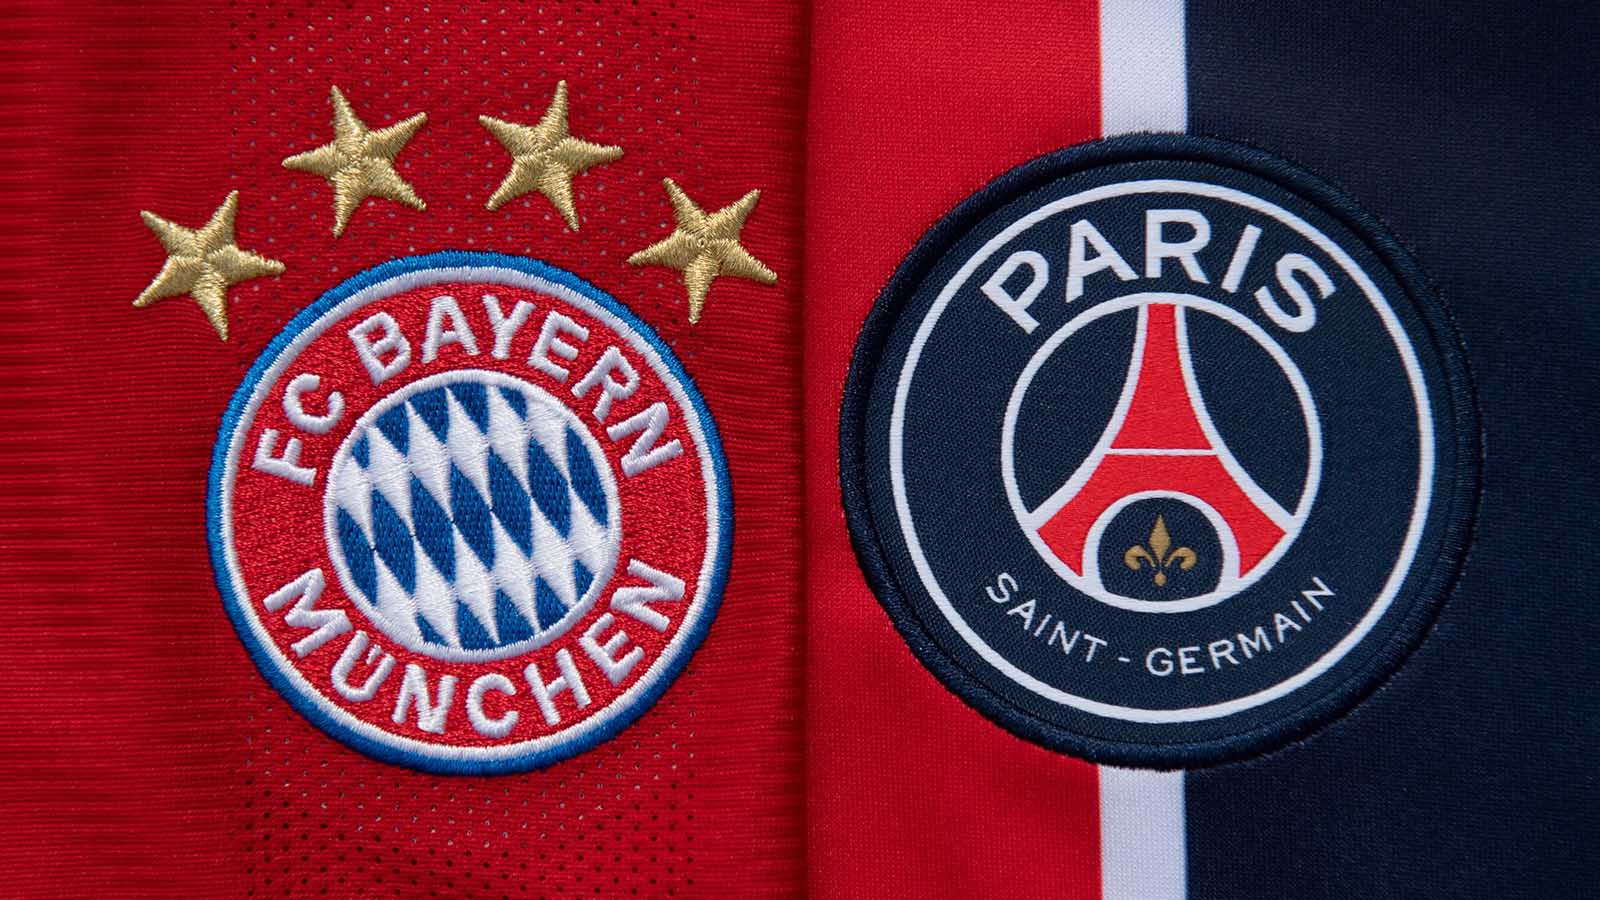 Champions League Final 2020 Psg Vs Bayern Munich Live Stream Reddit Soccer For Free Online Film Daily